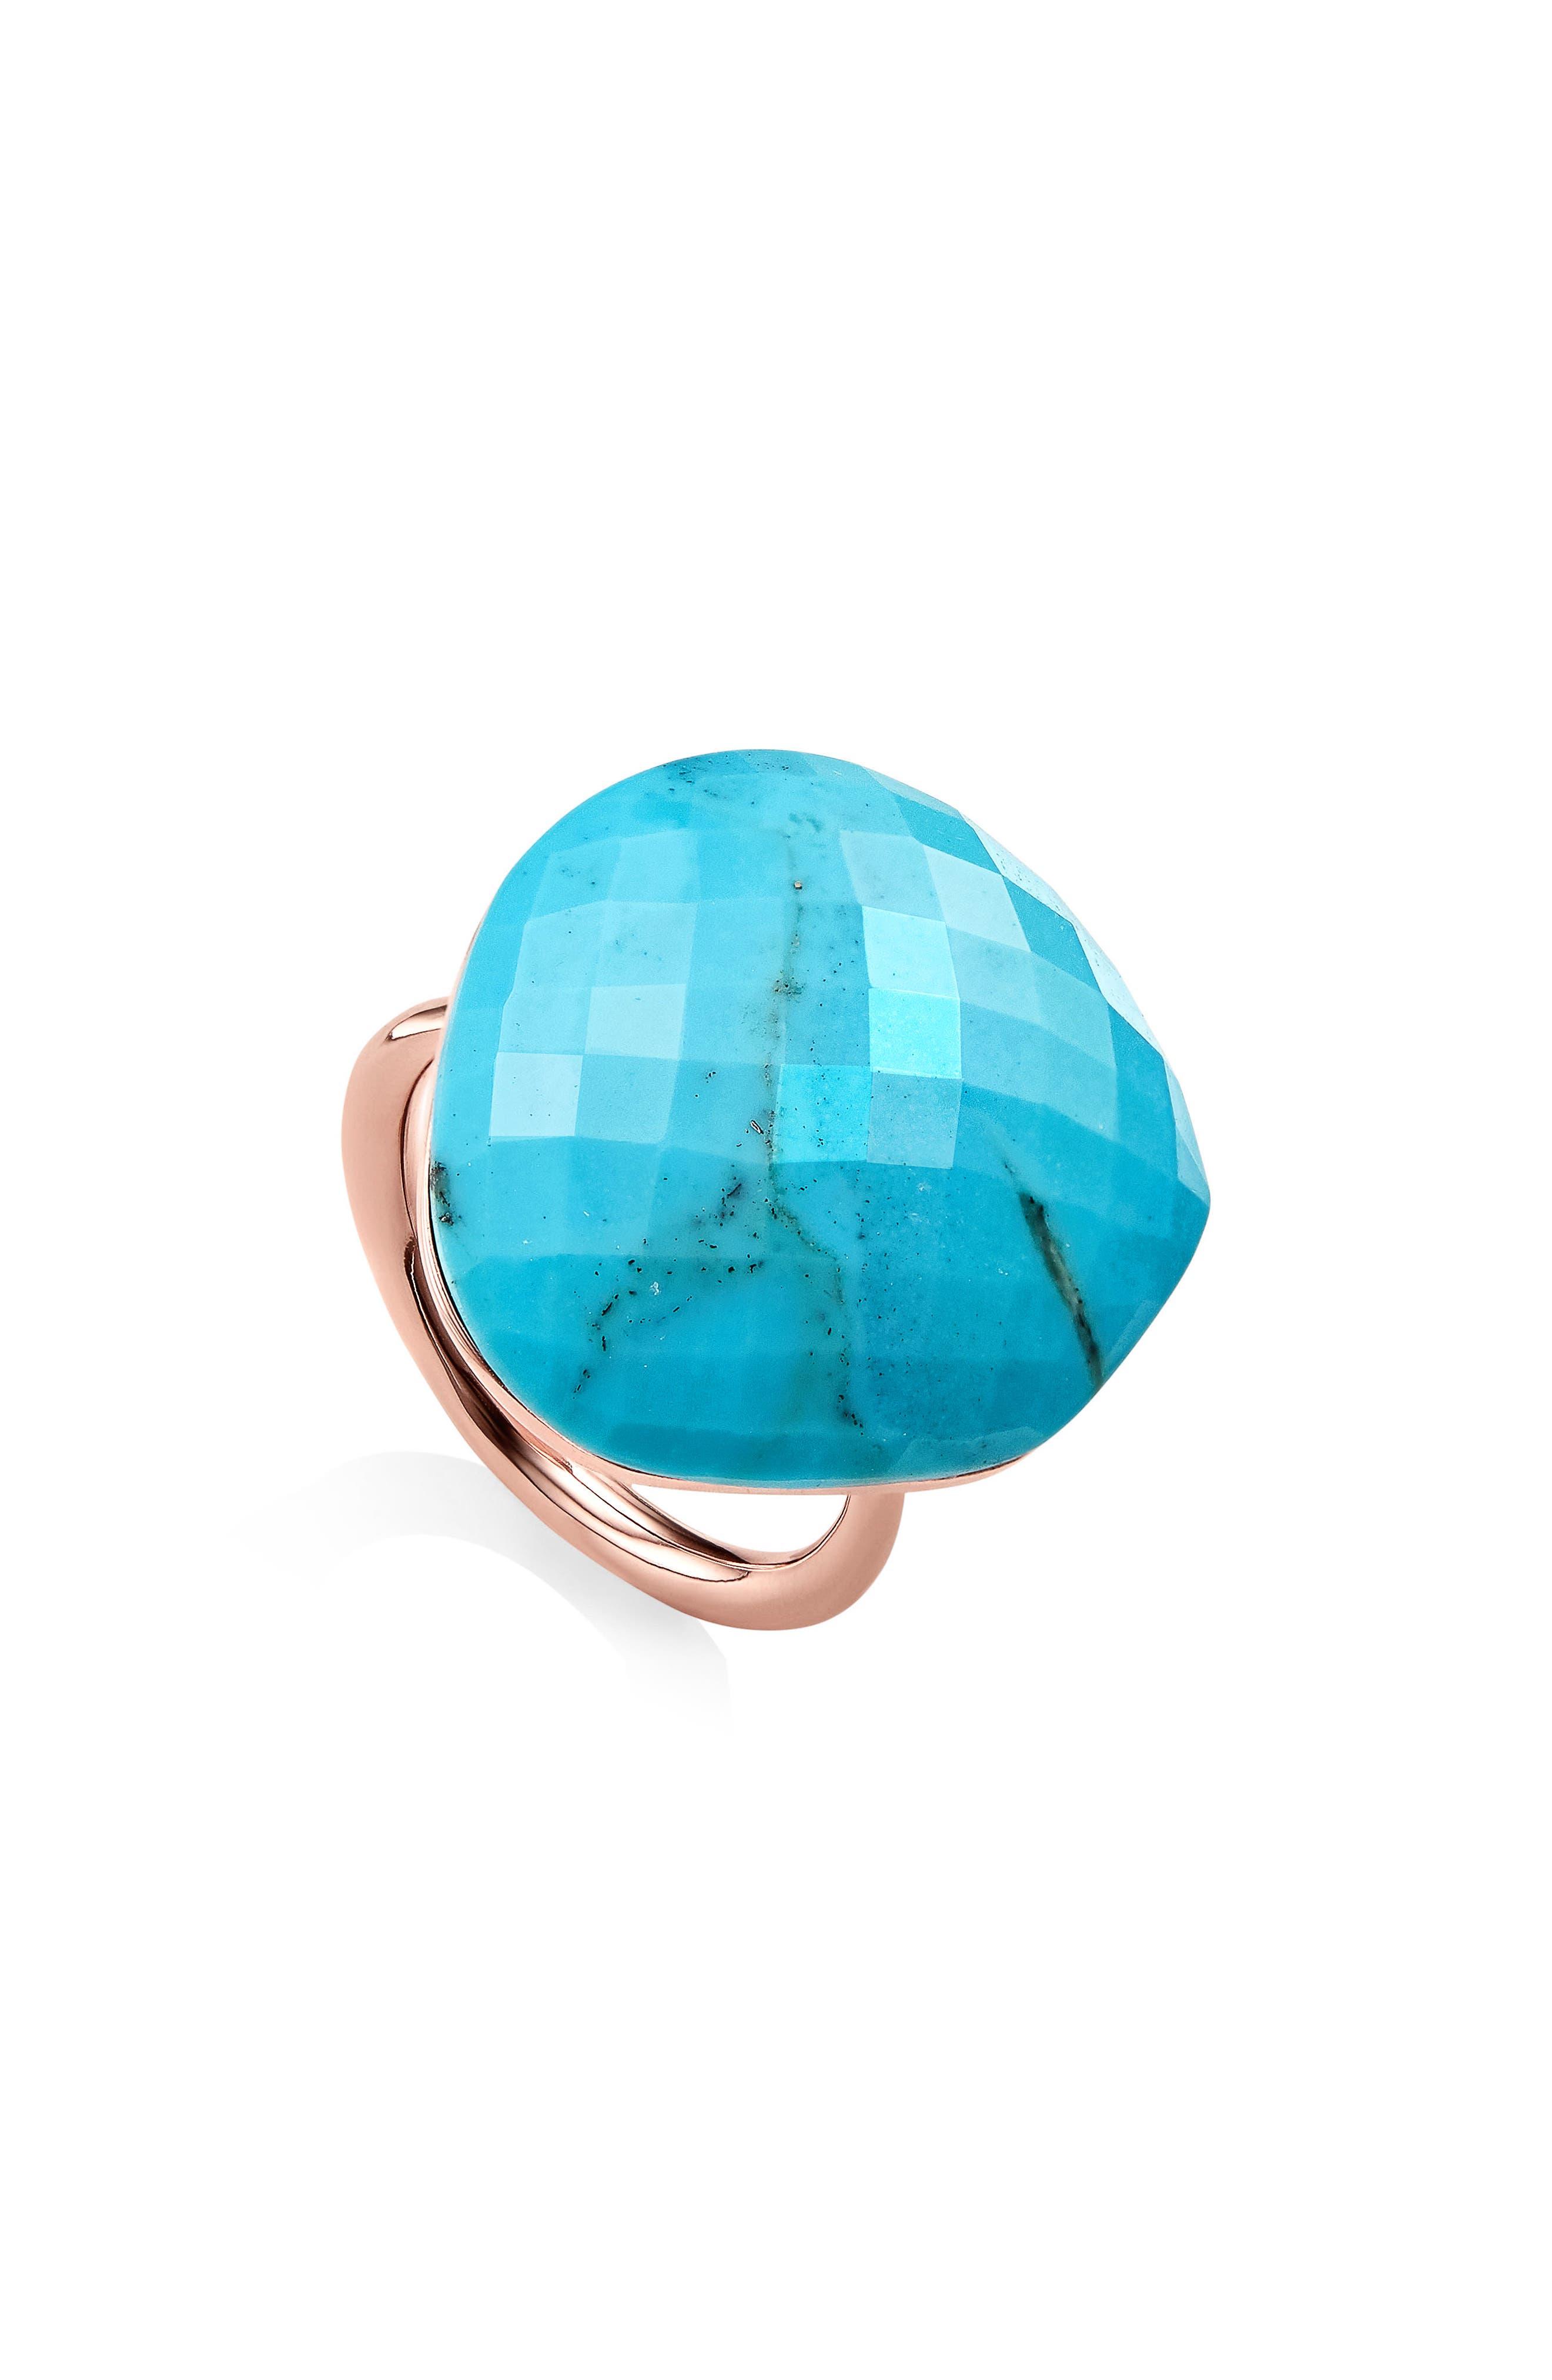 Nura Large Pebble Ring,                             Main thumbnail 1, color,                             TURQUOISE